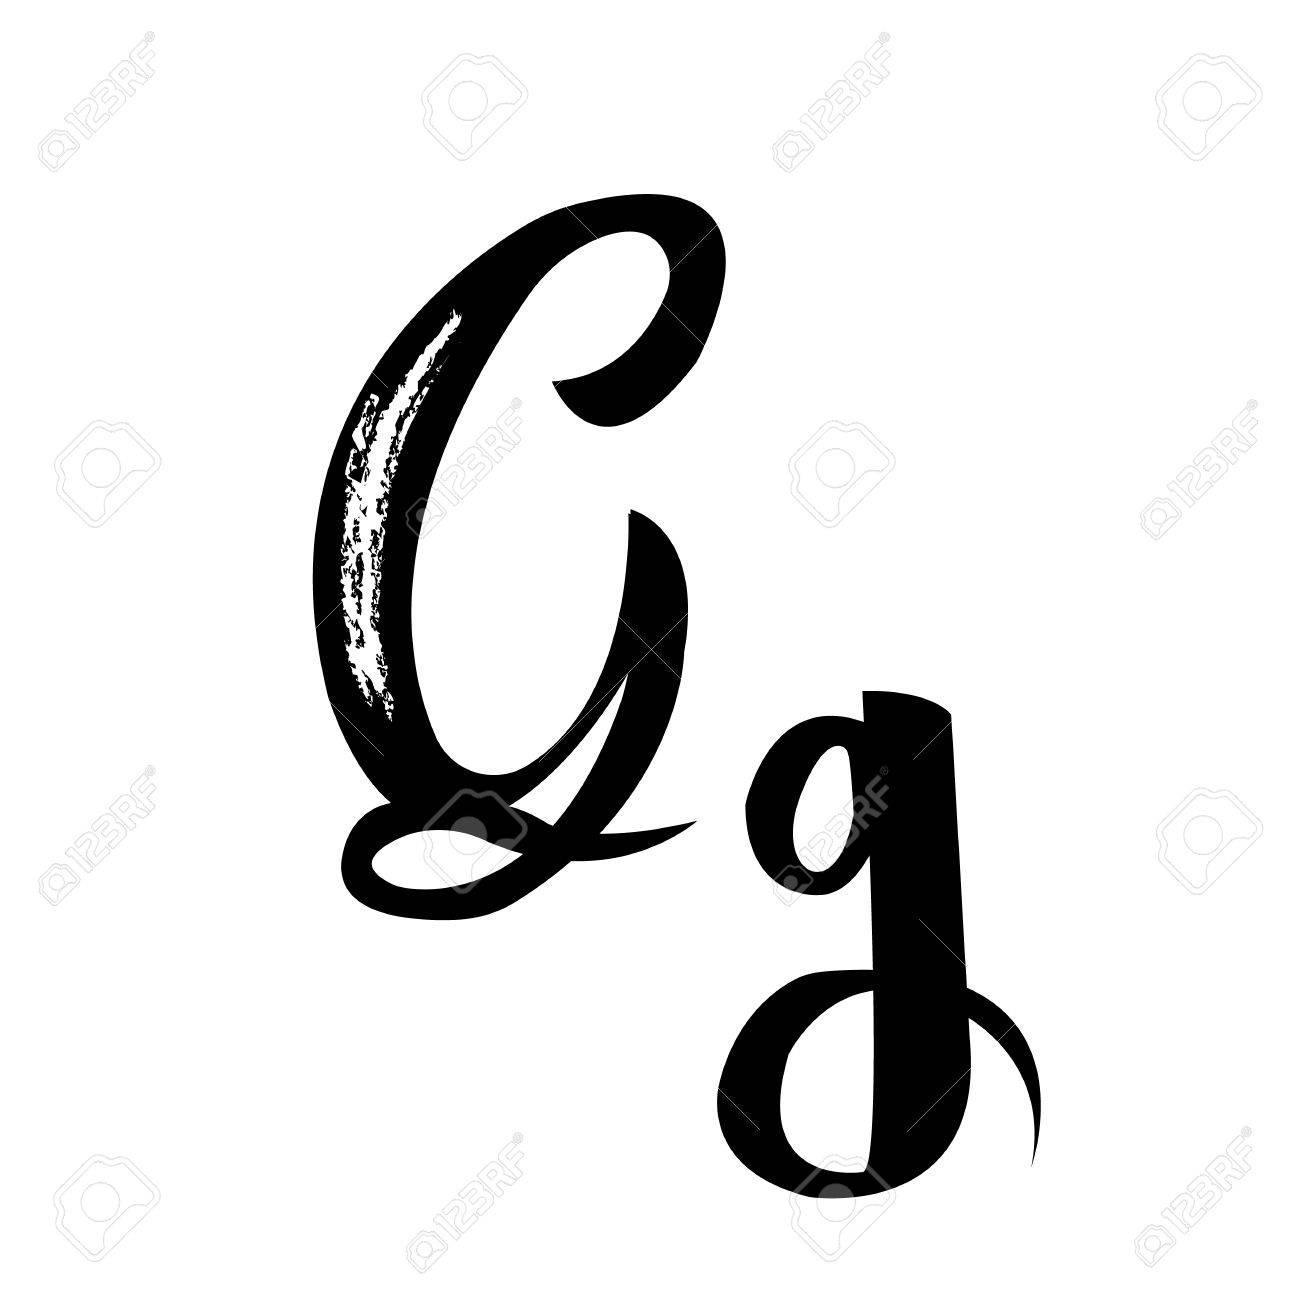 Alphabet Letters G Manuscript Calligraphy Vector Art Stock